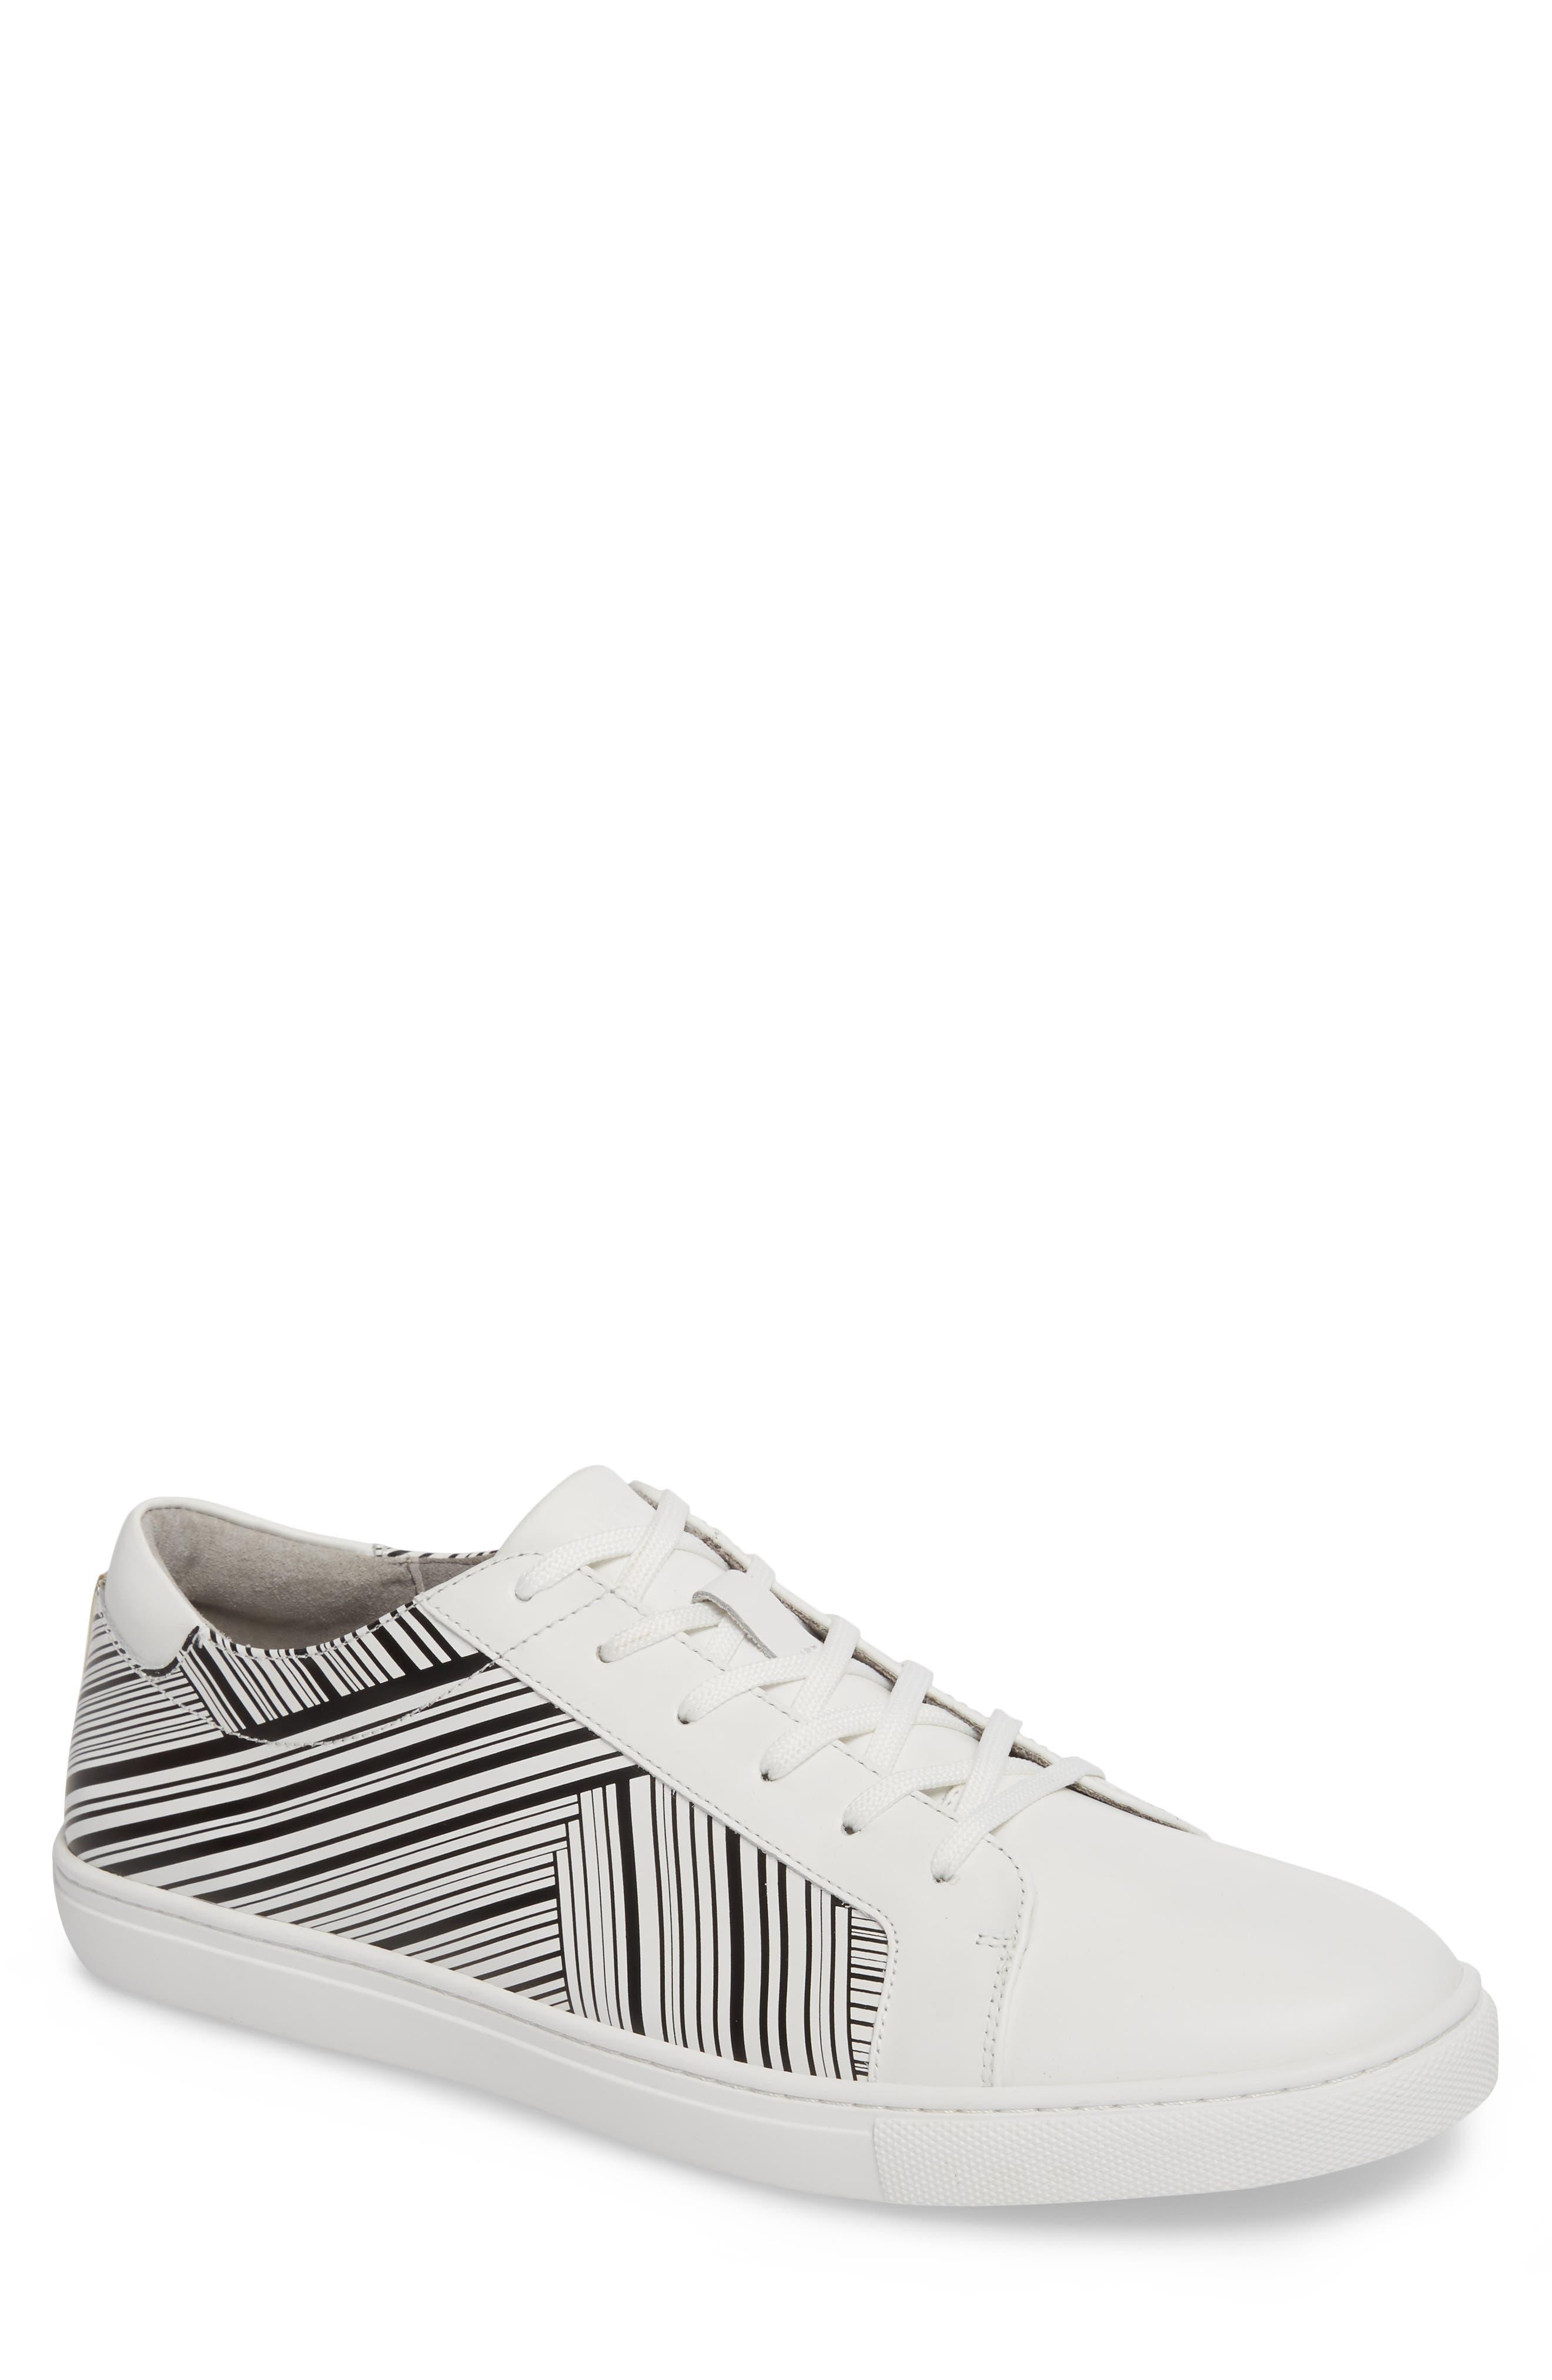 Kam Sneaker,                         Main,                         color, White/ Black Leather